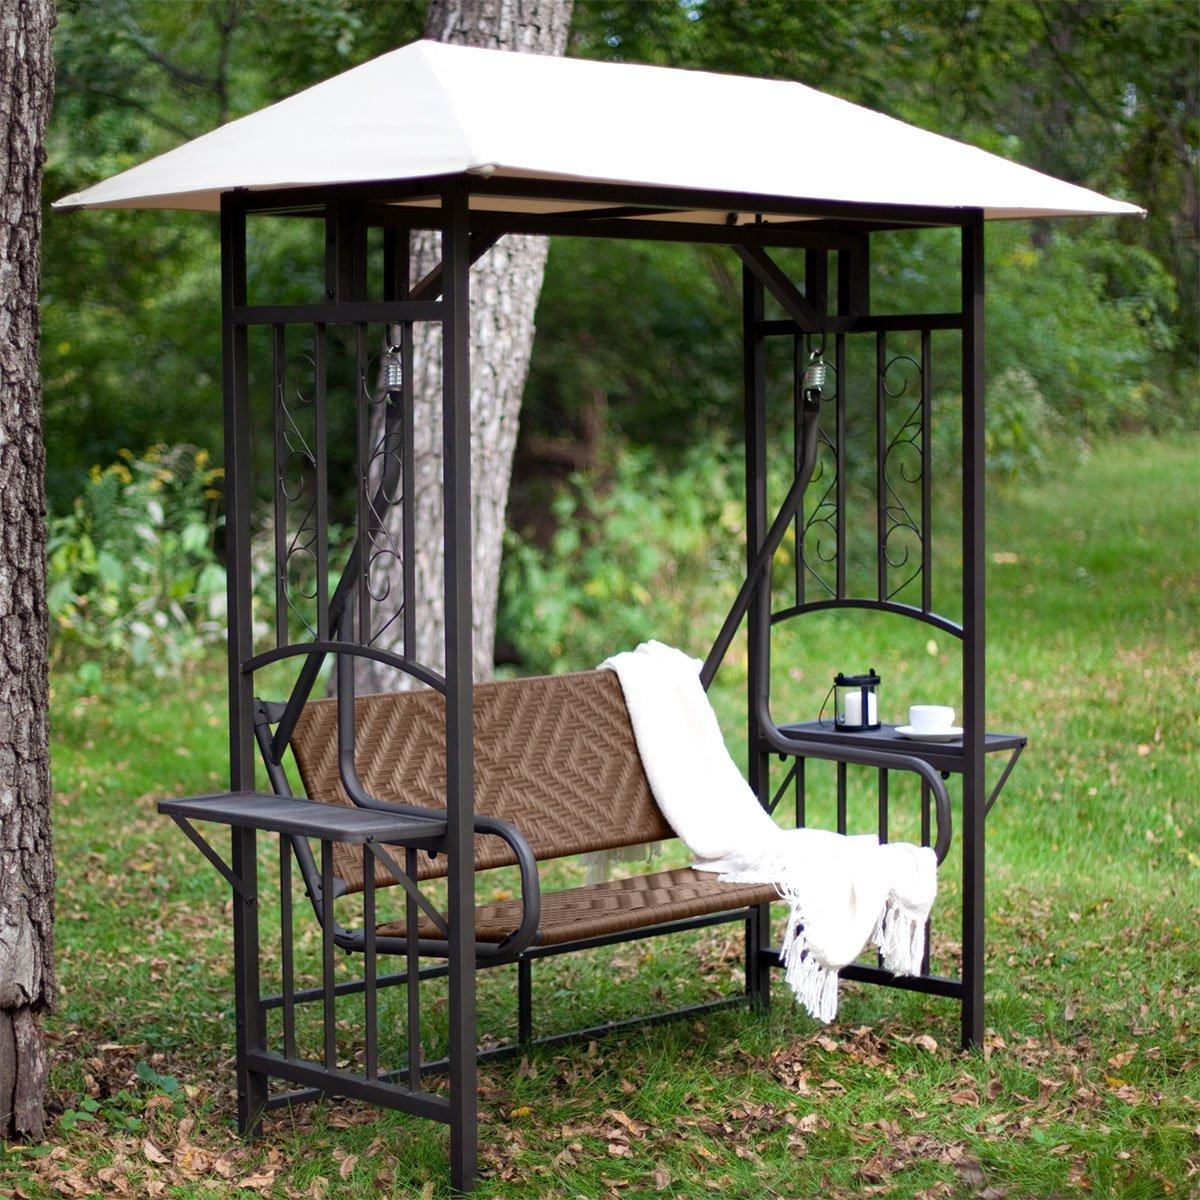 10 Pretty Porch Swings – The Family Handyman Regarding 2 Person Black Steel Outdoor Swings (View 10 of 25)